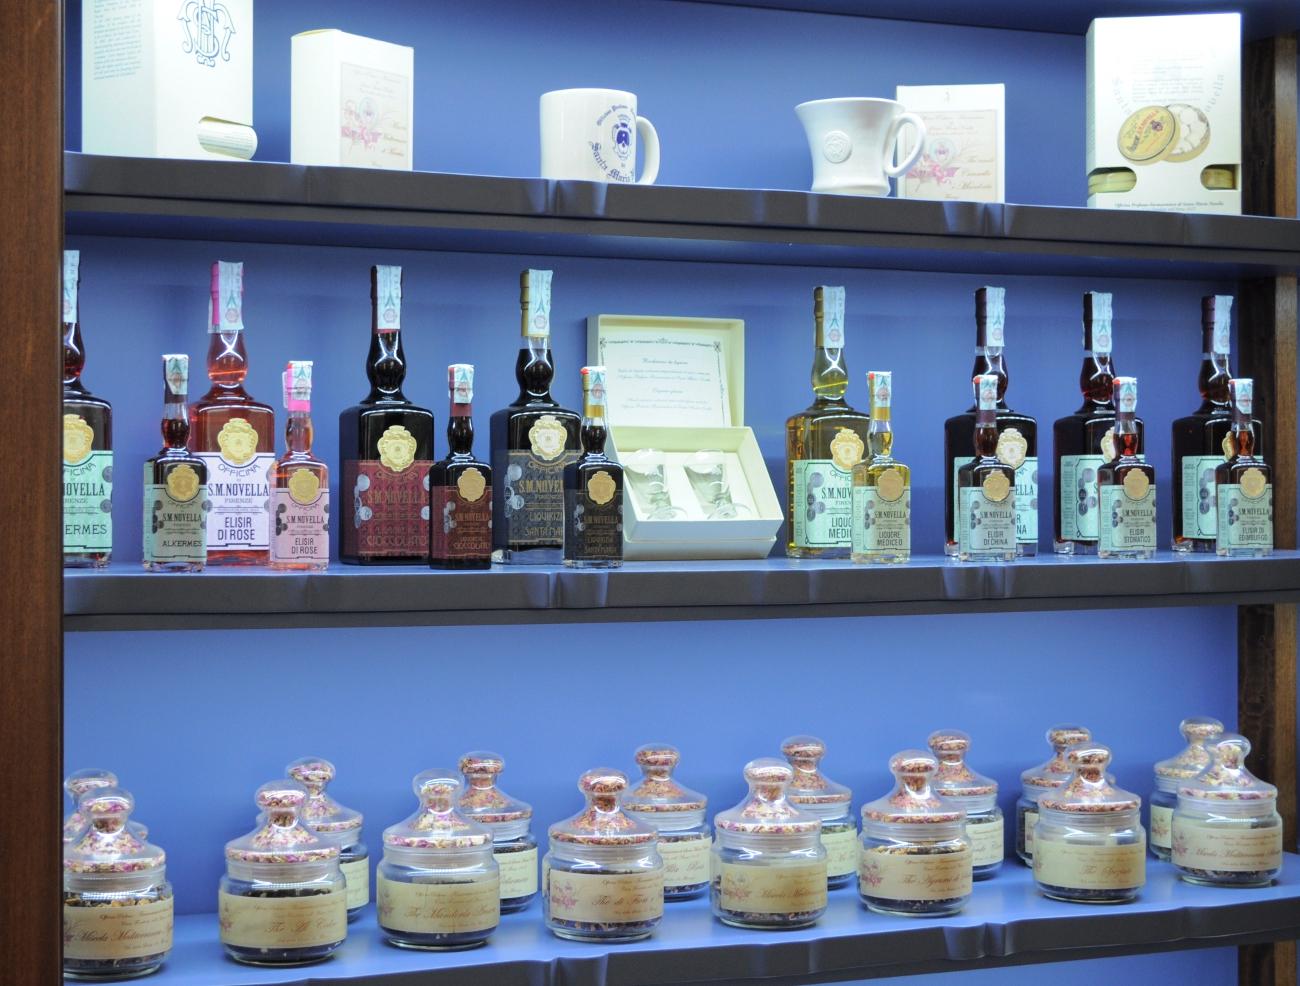 rocaille-blog-officina-profumo-farmaceutica-santa-maria-novella-shop-negozio-storico-sede-firenze-39